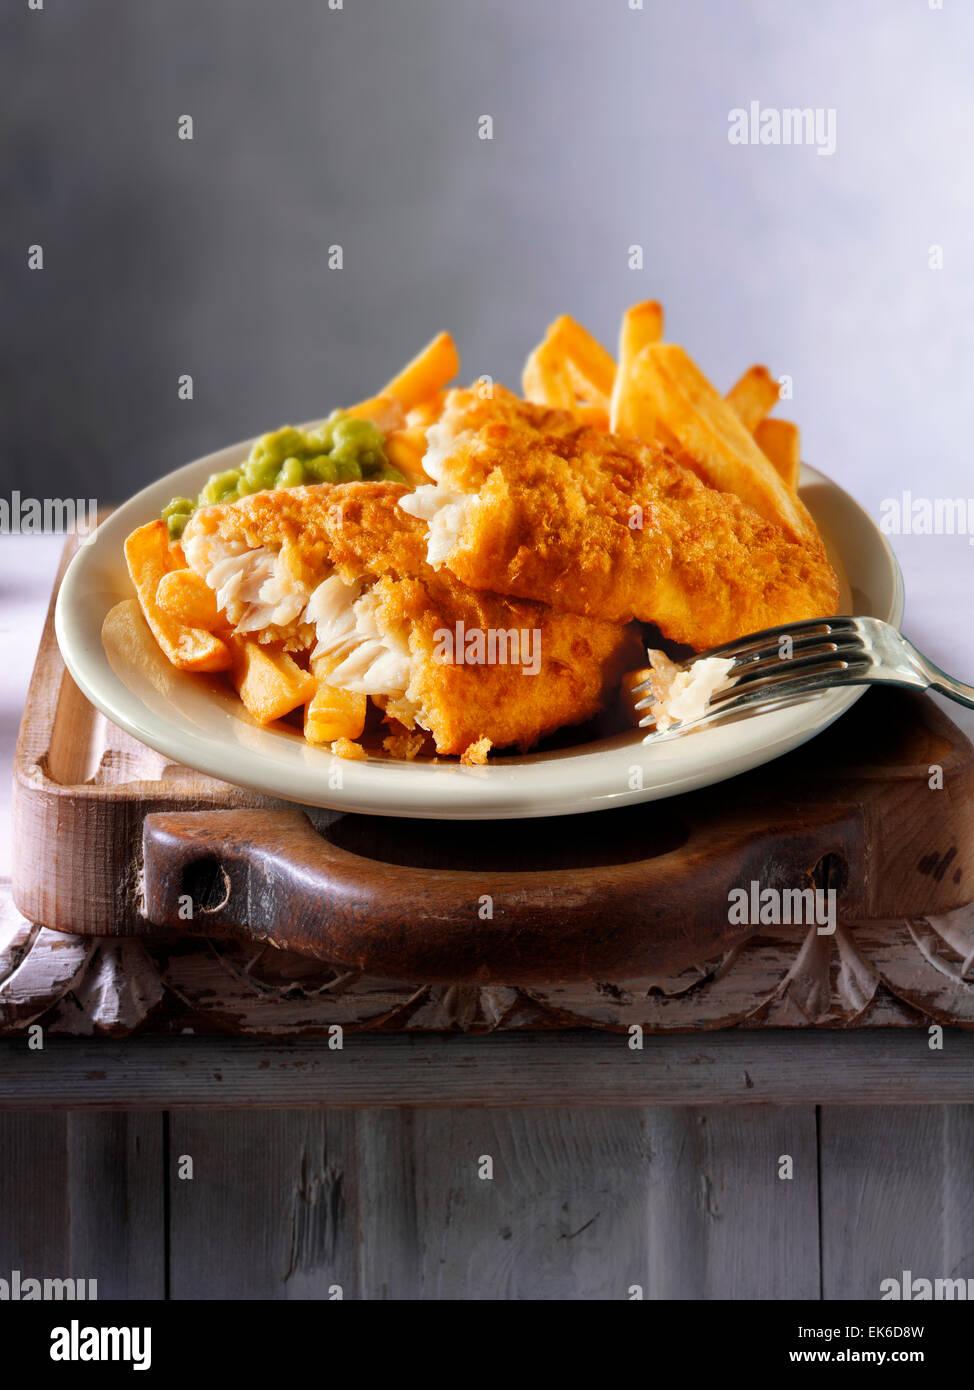 Traditionelle britische battered Fish & chips Stockbild